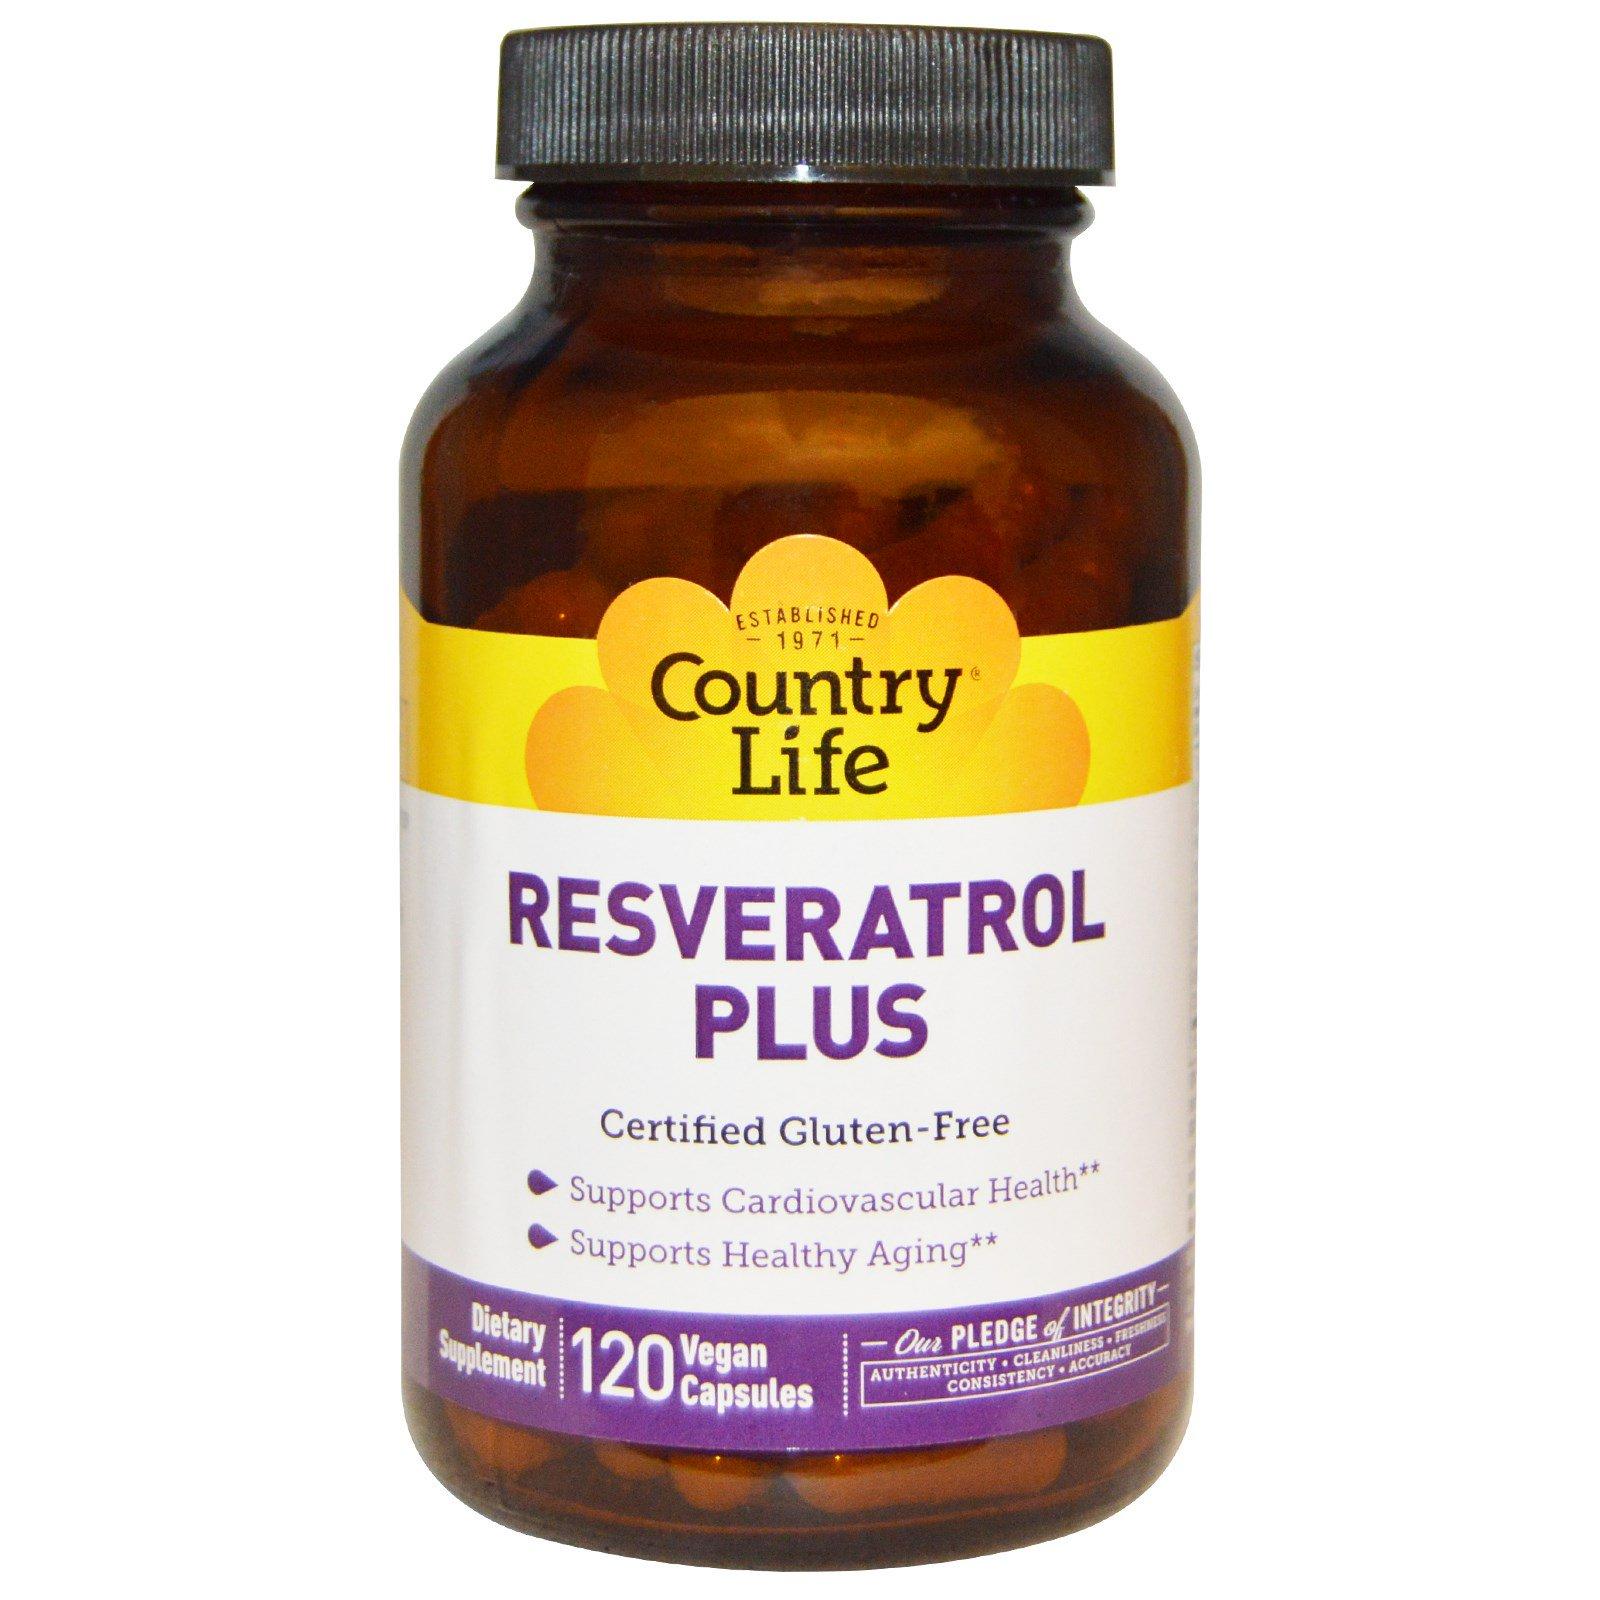 Country Life Resveratrol Plus 120 Vegan Capsules Iherb